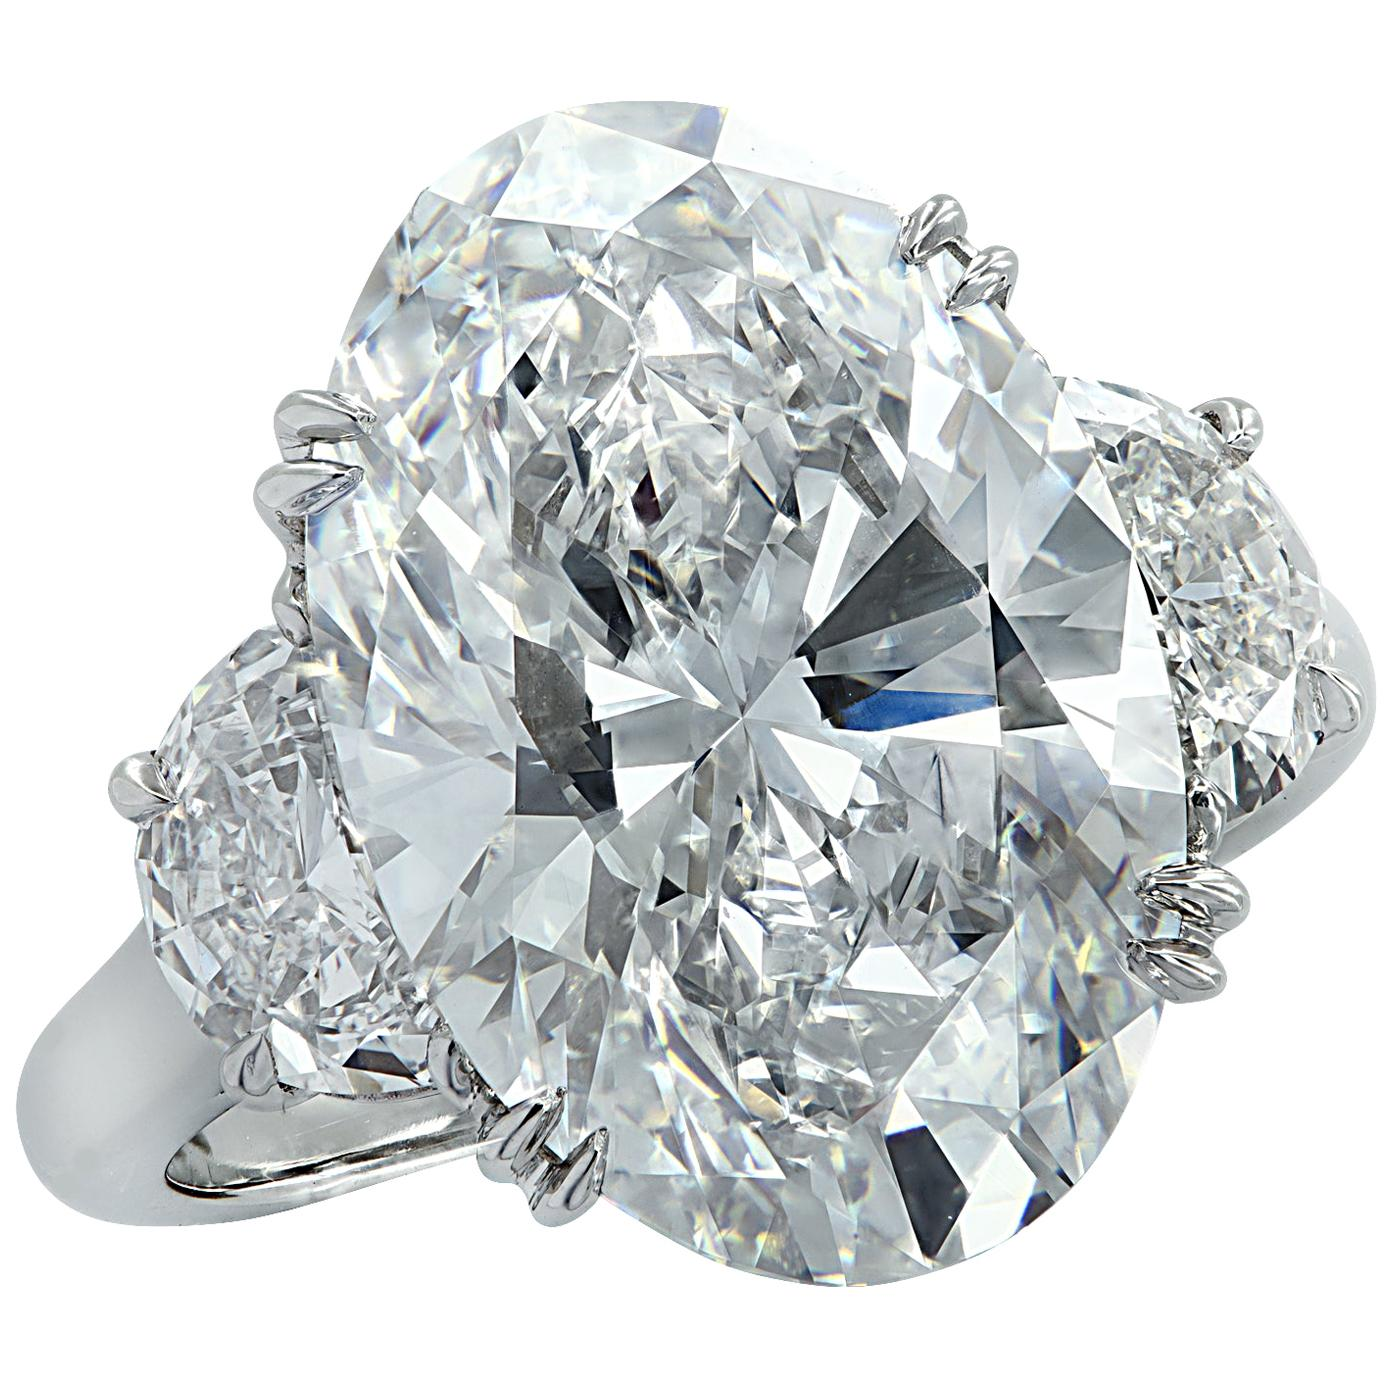 Vivid Diamonds GIA Certified 9.03 Carat Oval Diamond Engagement Ring